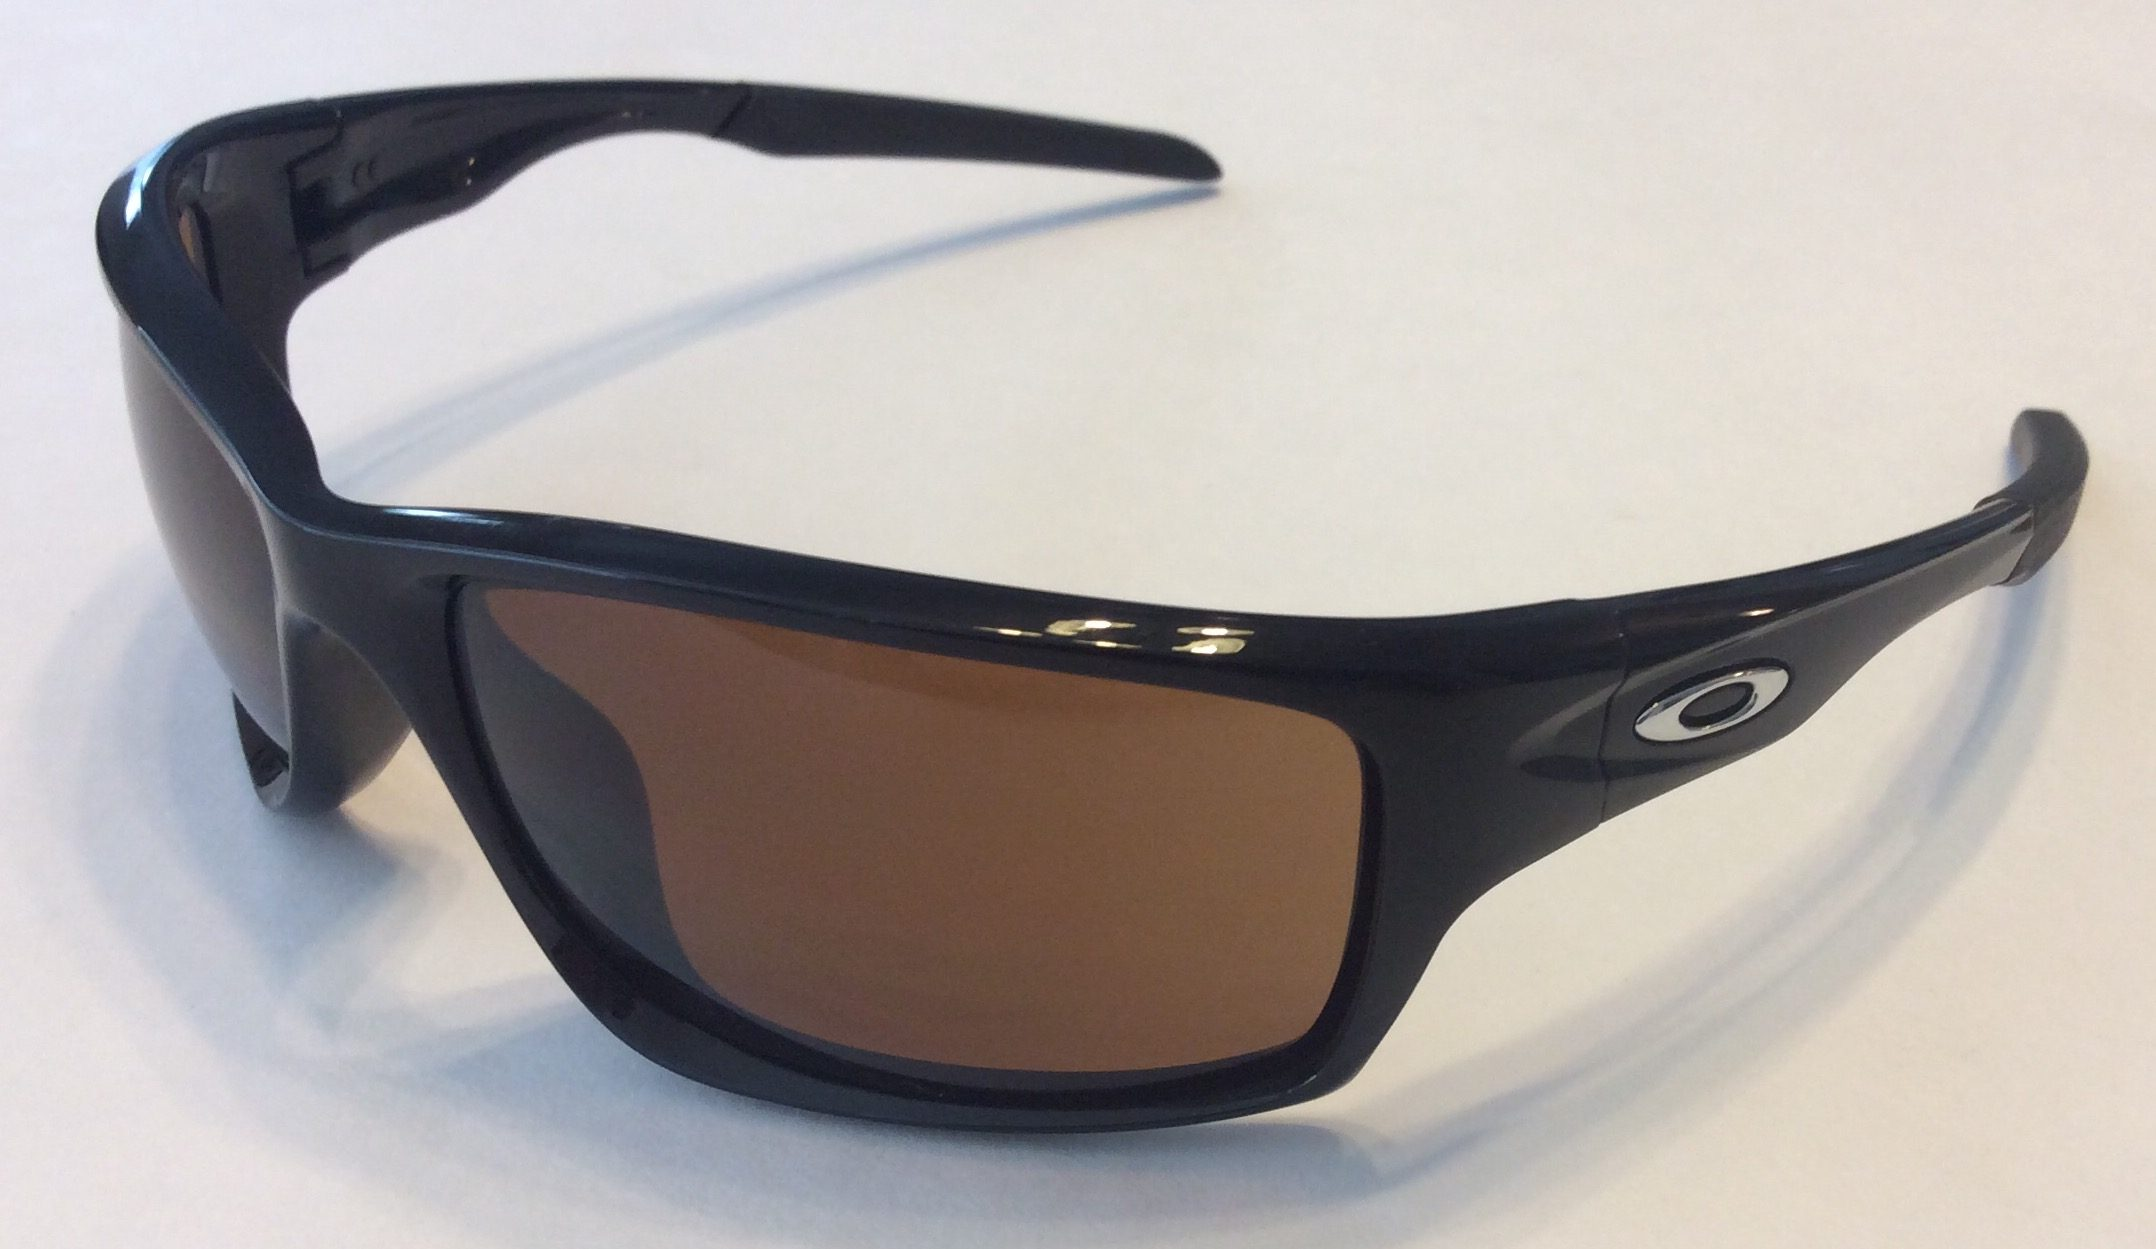 356efd3b3f4e Oakley Canteen Sunglasses - Polished Black - Dark Bronze OO9225-12